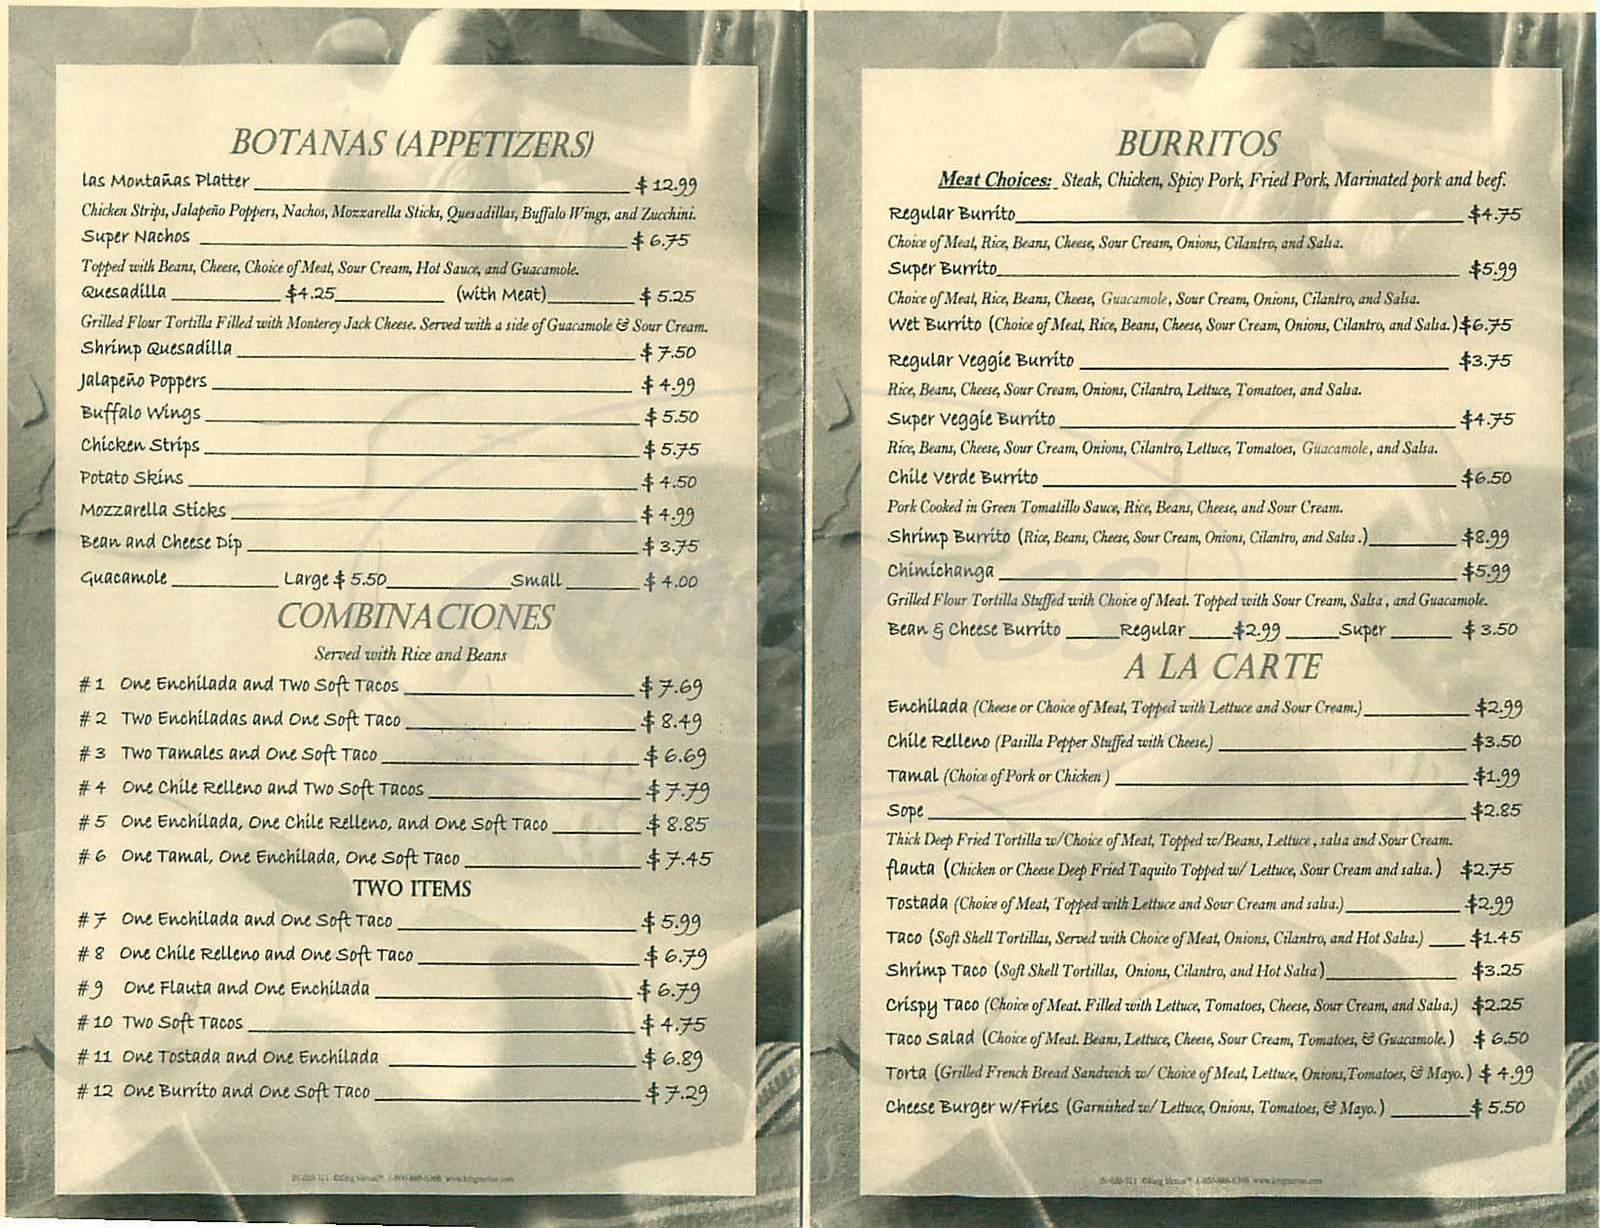 menu for Las Montanas